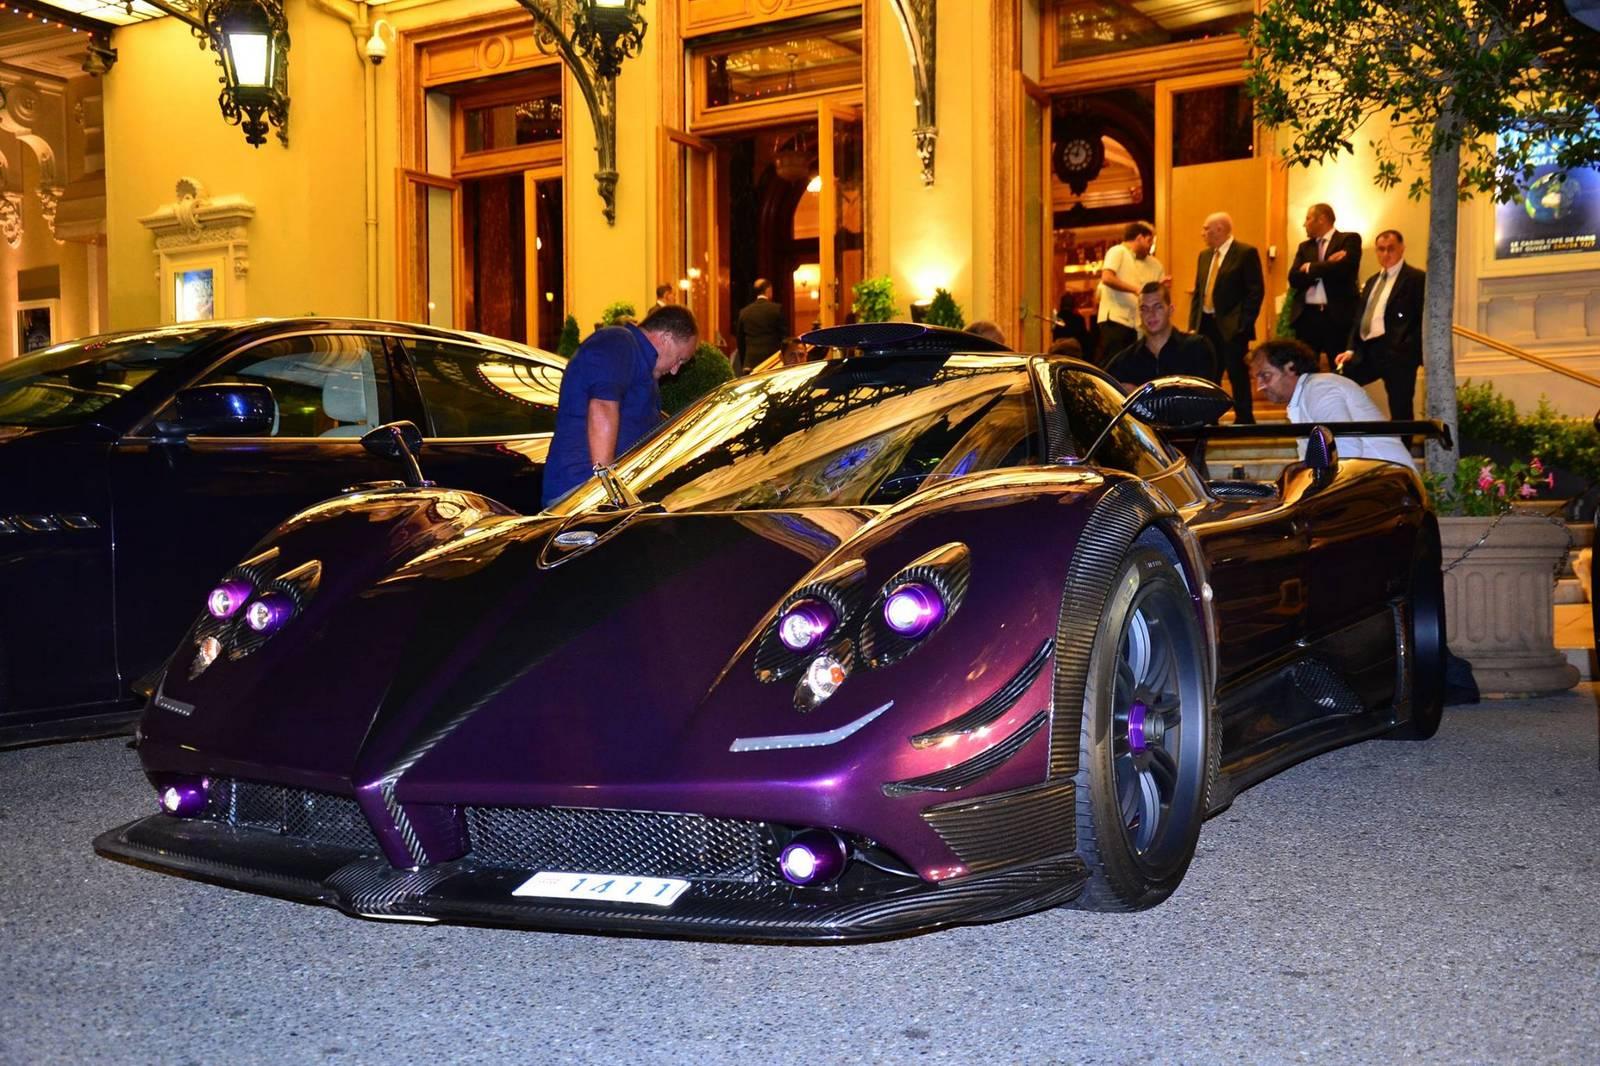 Gallery: Pagani Zonda 760 LH by Night in Monaco - GTspirit